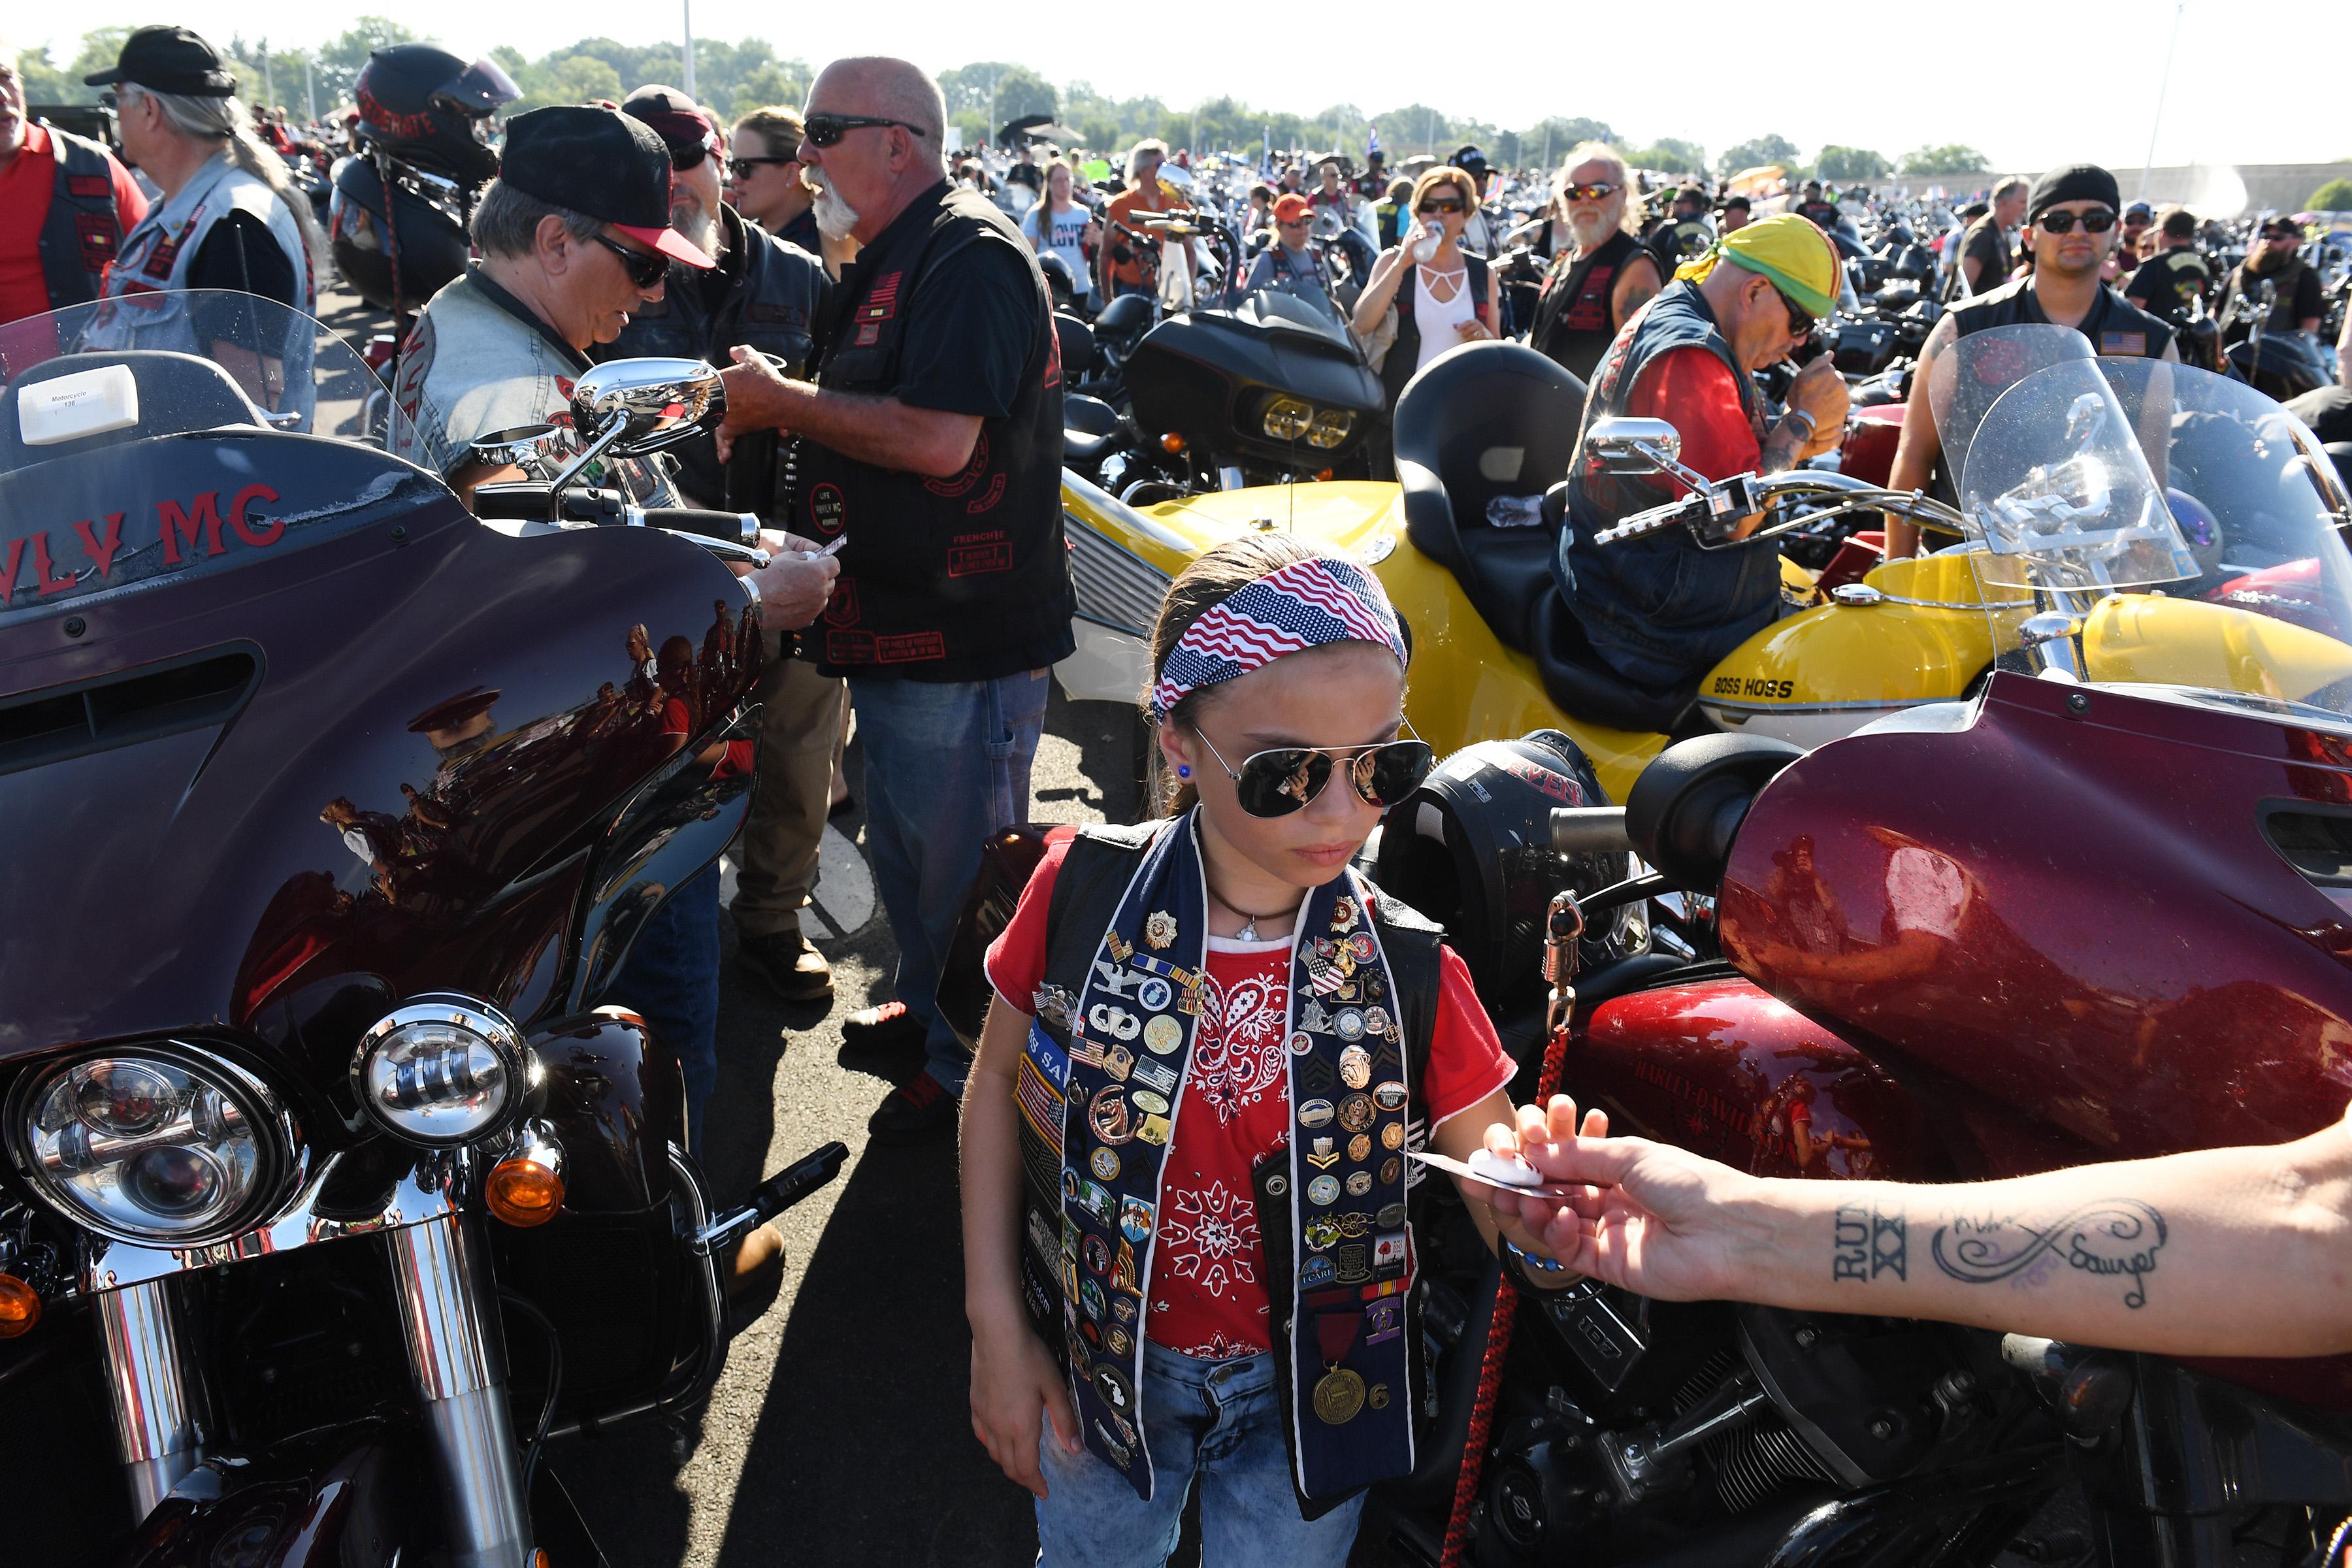 Rolling Thunder's last ride in Washington - The Washington Post